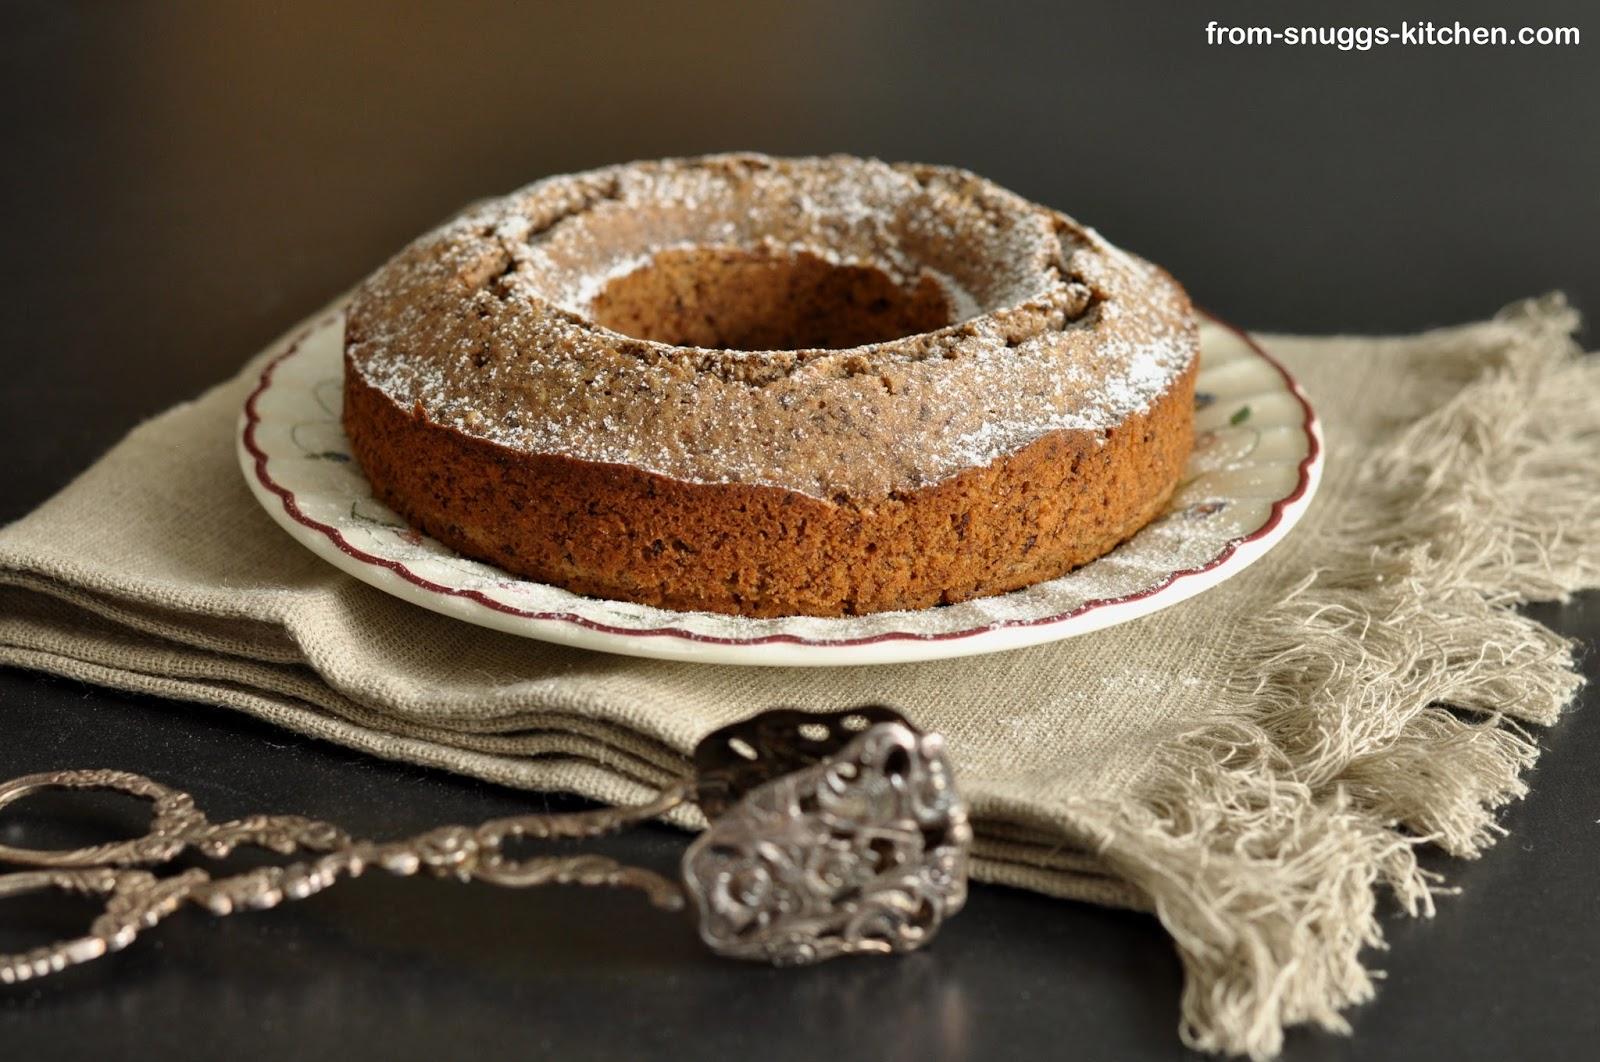 Kaffee-Nuss-Kuchen